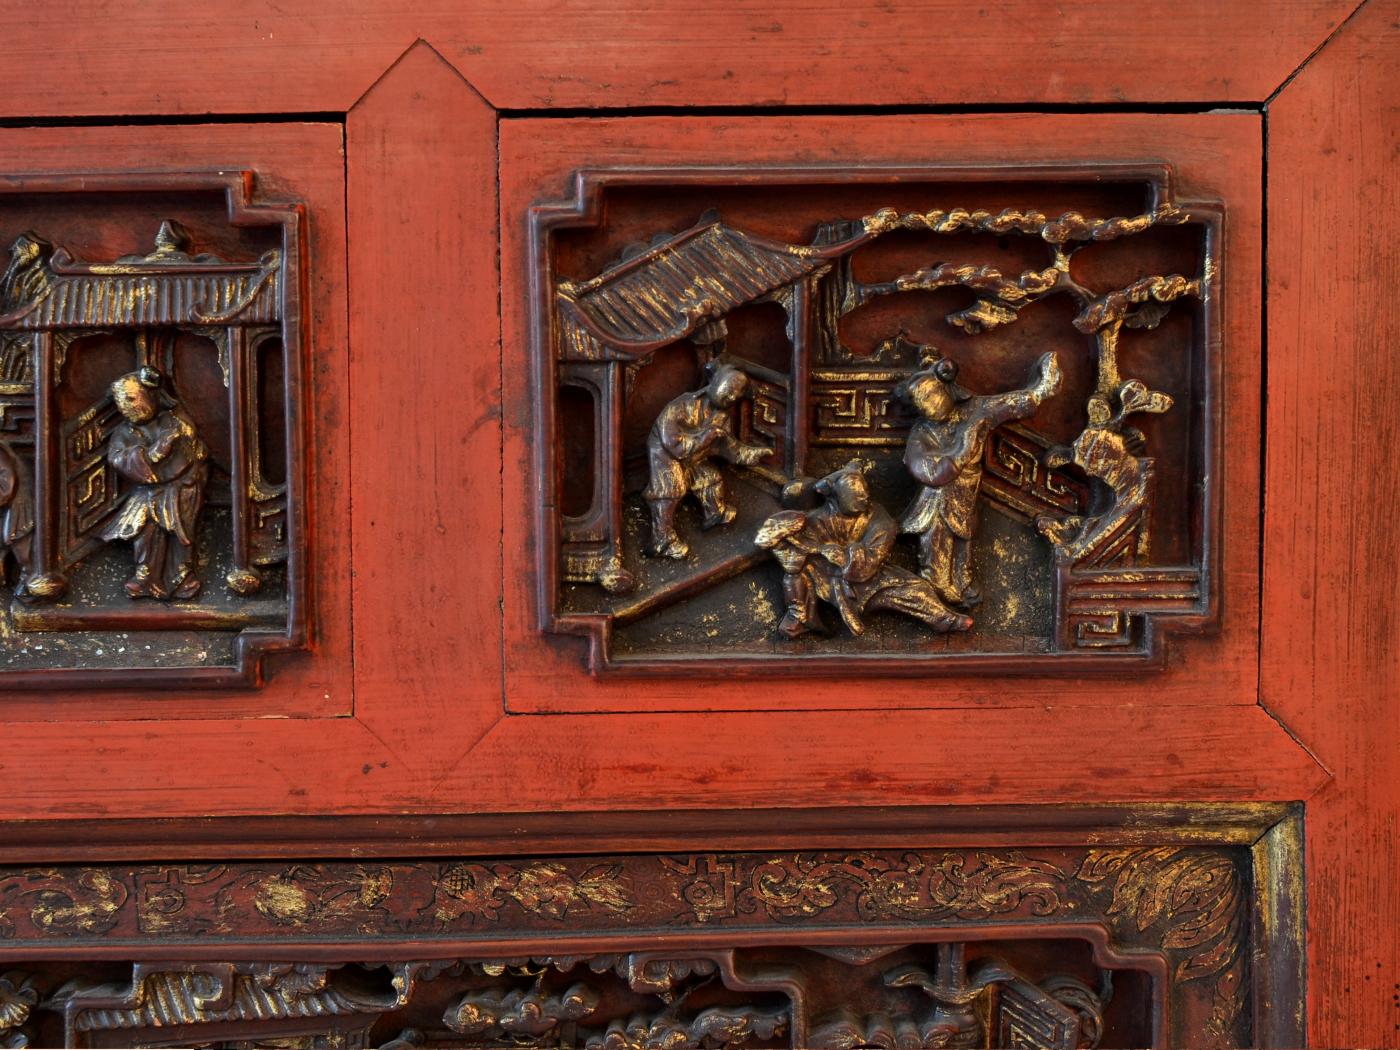 Panou chinezesc sec XVIII